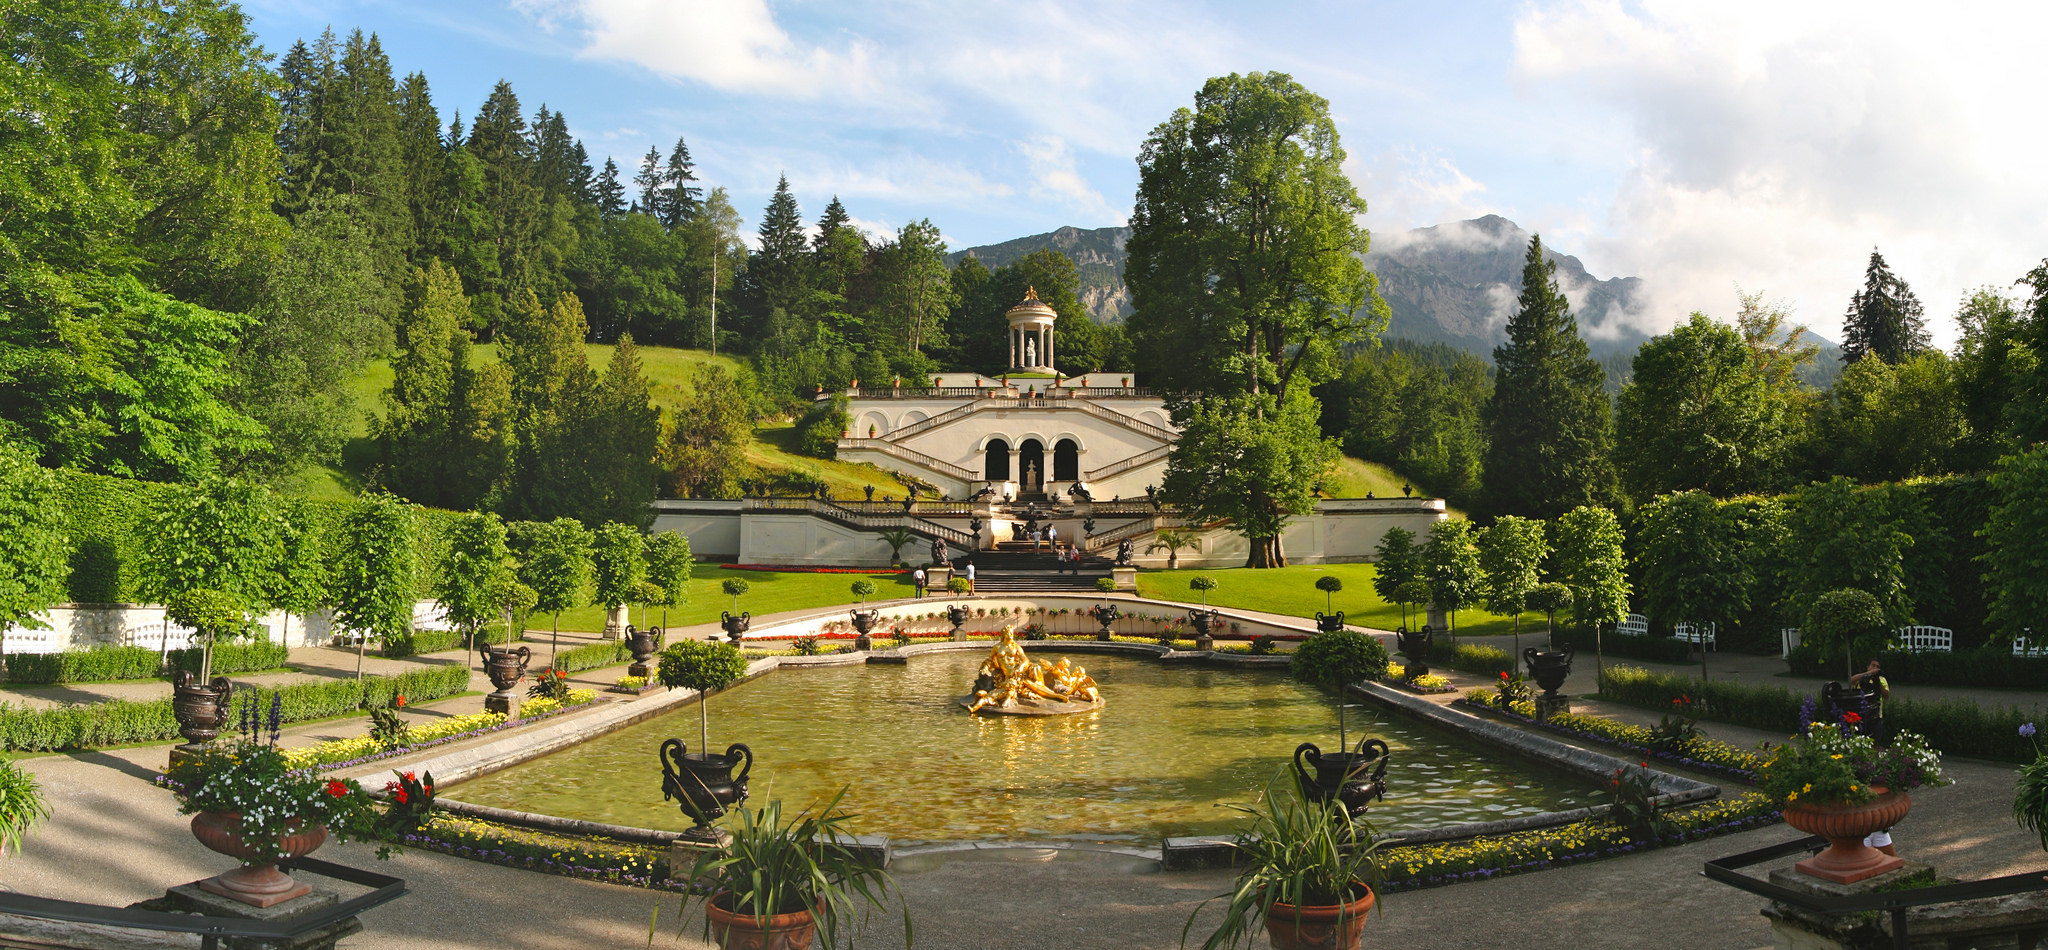 о нас, экскурсии по Баварии, замки Баварии, Мюнхен, munich travel, flickr